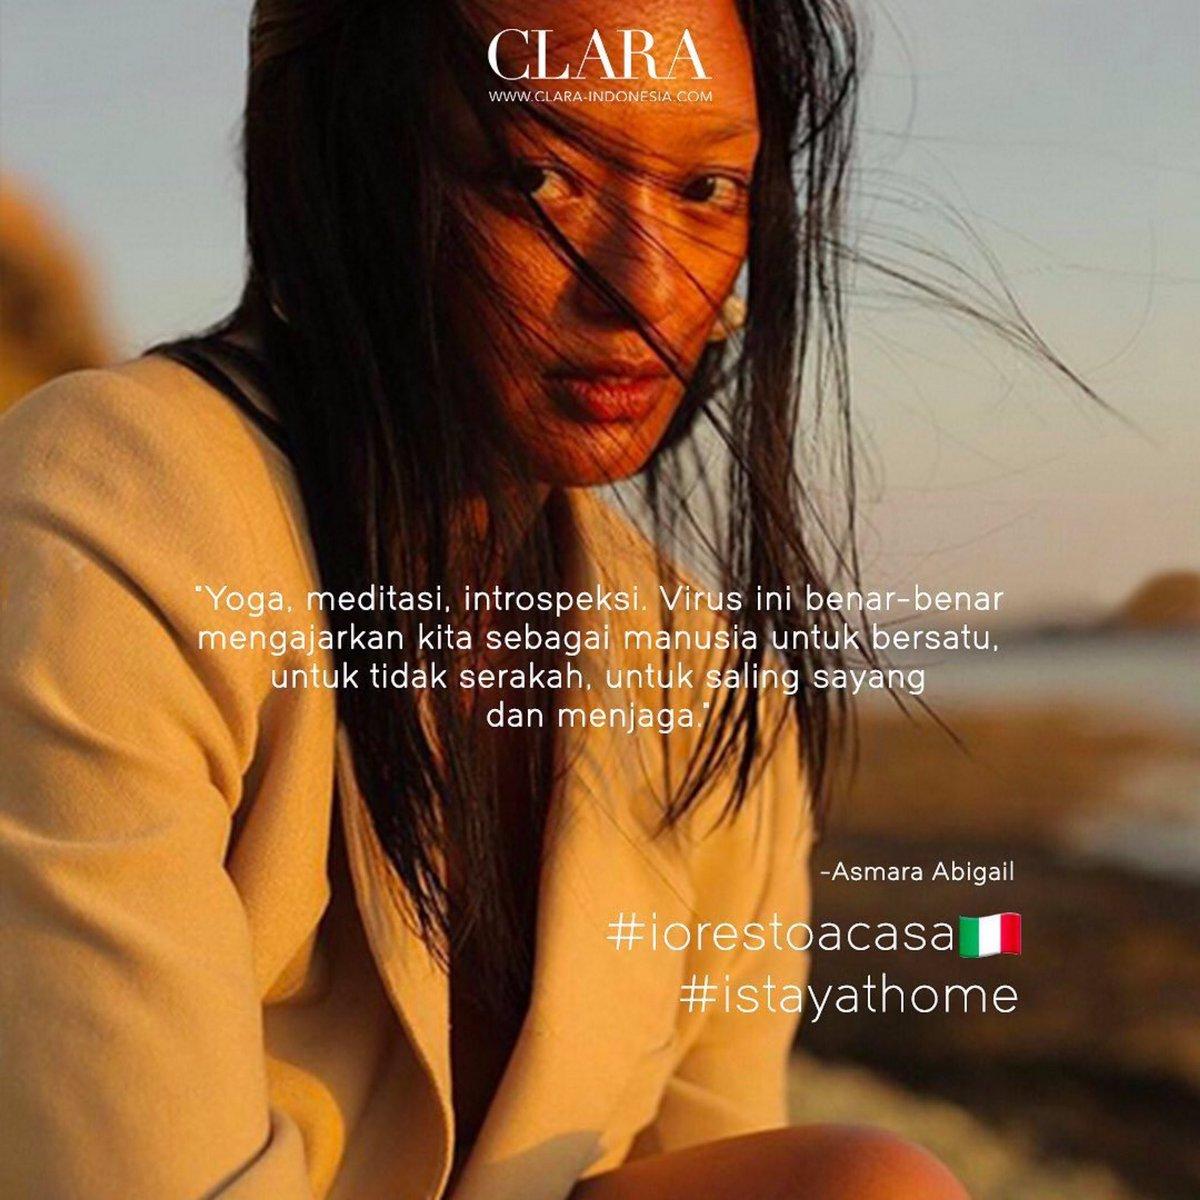 ASMARA ABIGAIL for  @CLARA_Indonesia .  @sulung88 @willysuteja